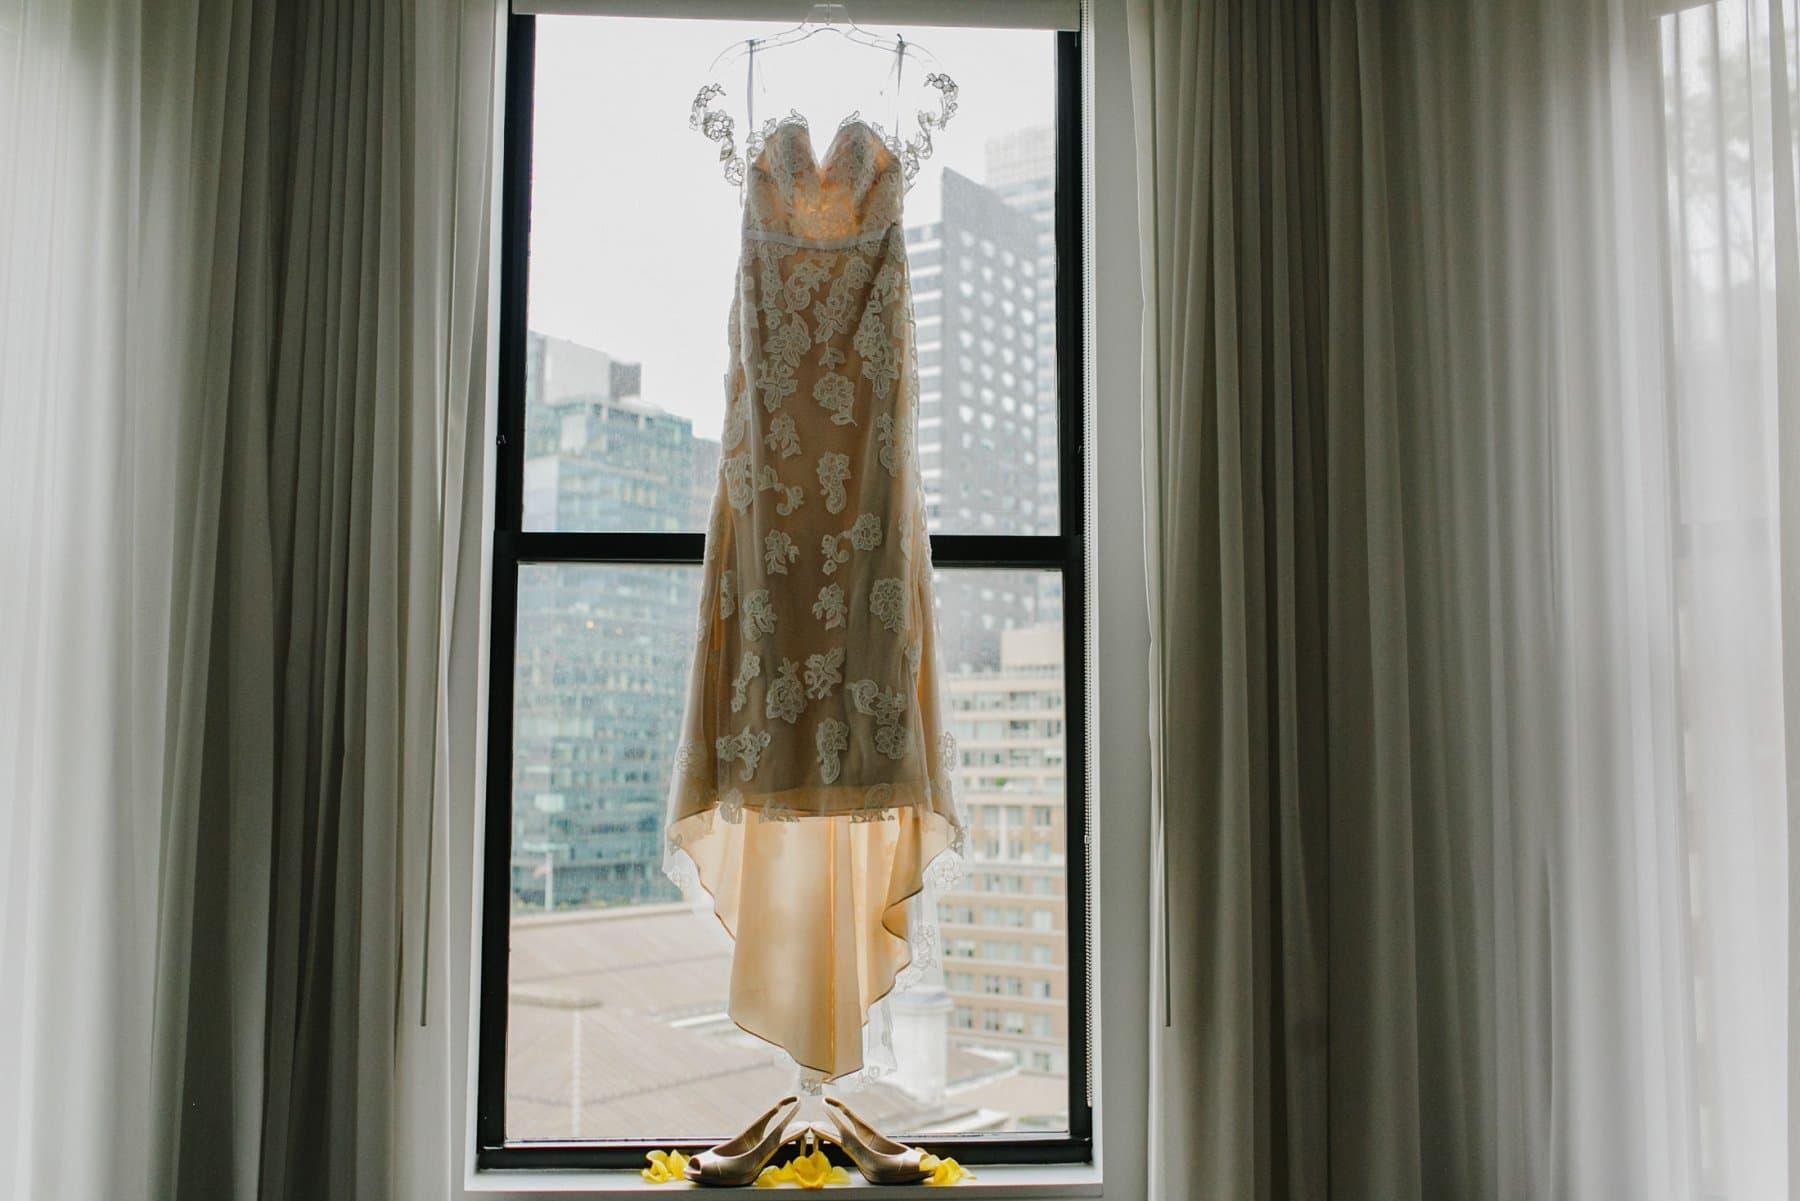 BHLDN wedding dress in window of Bryant Park Hotel in Manhattan